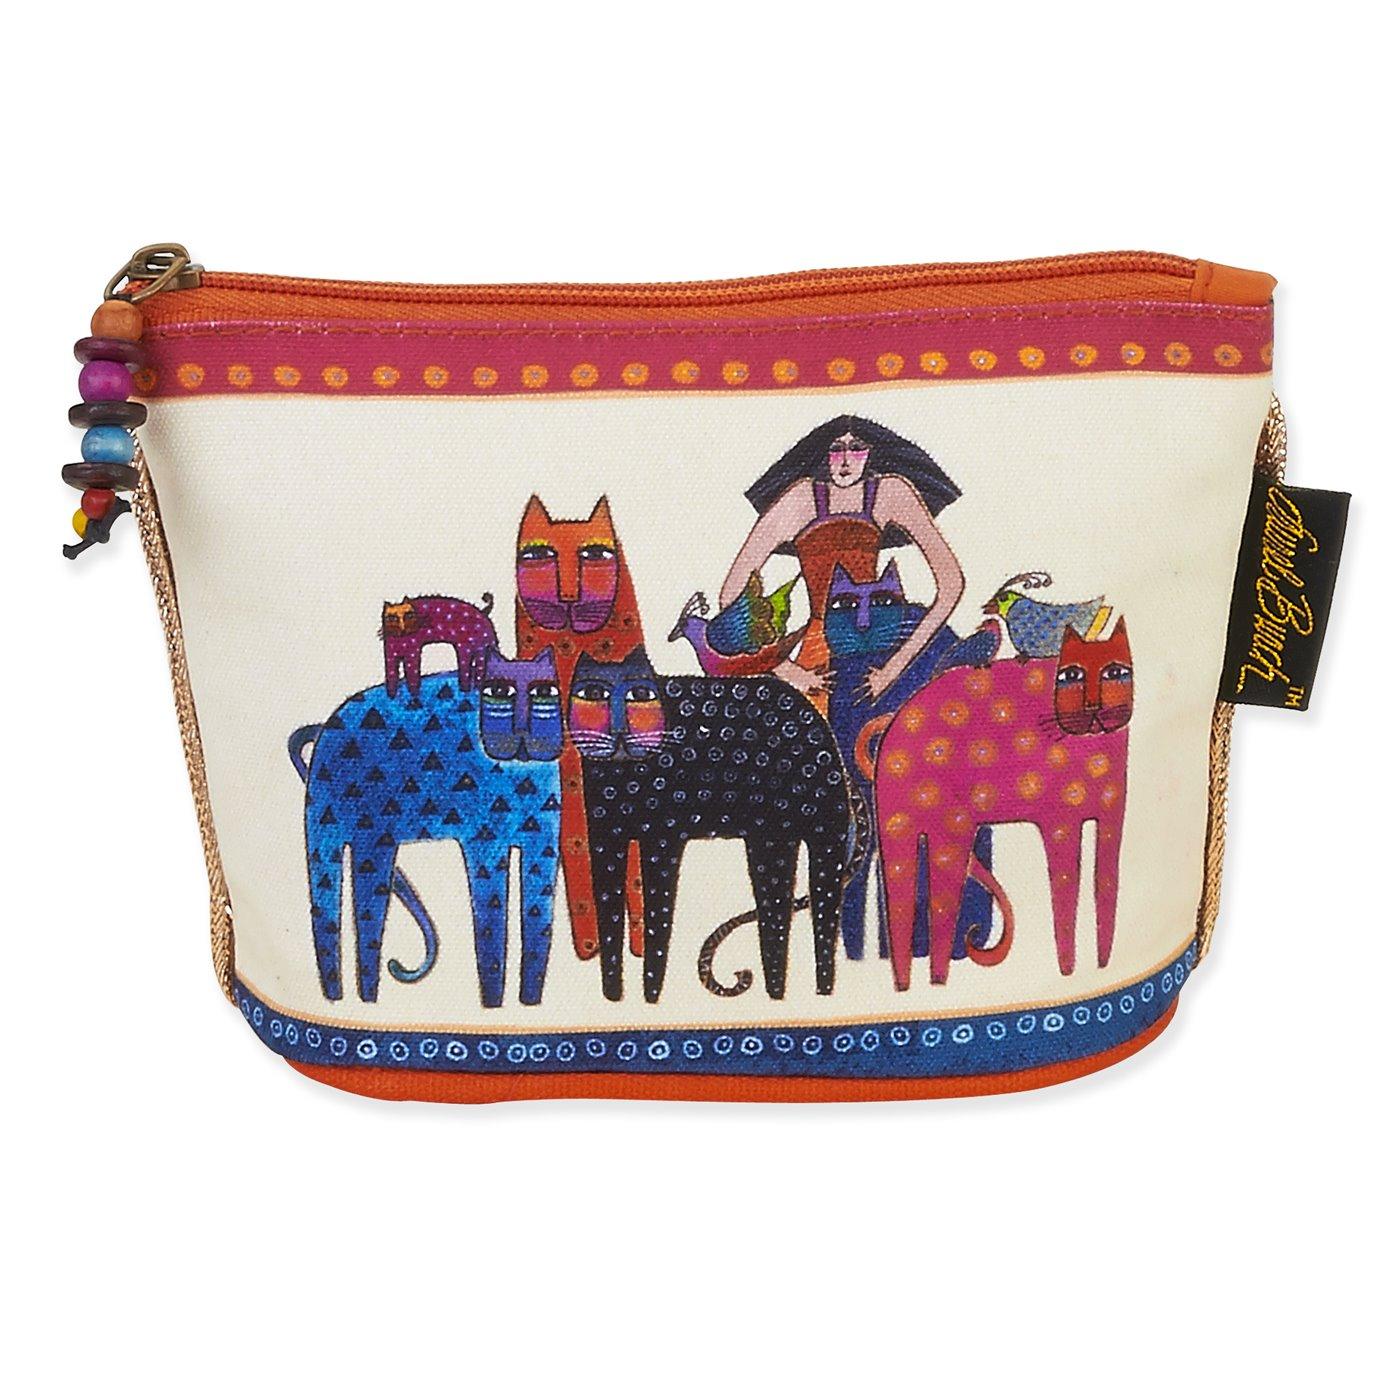 Laurel Burch Feline Mini Cosmetic Bag - large cats